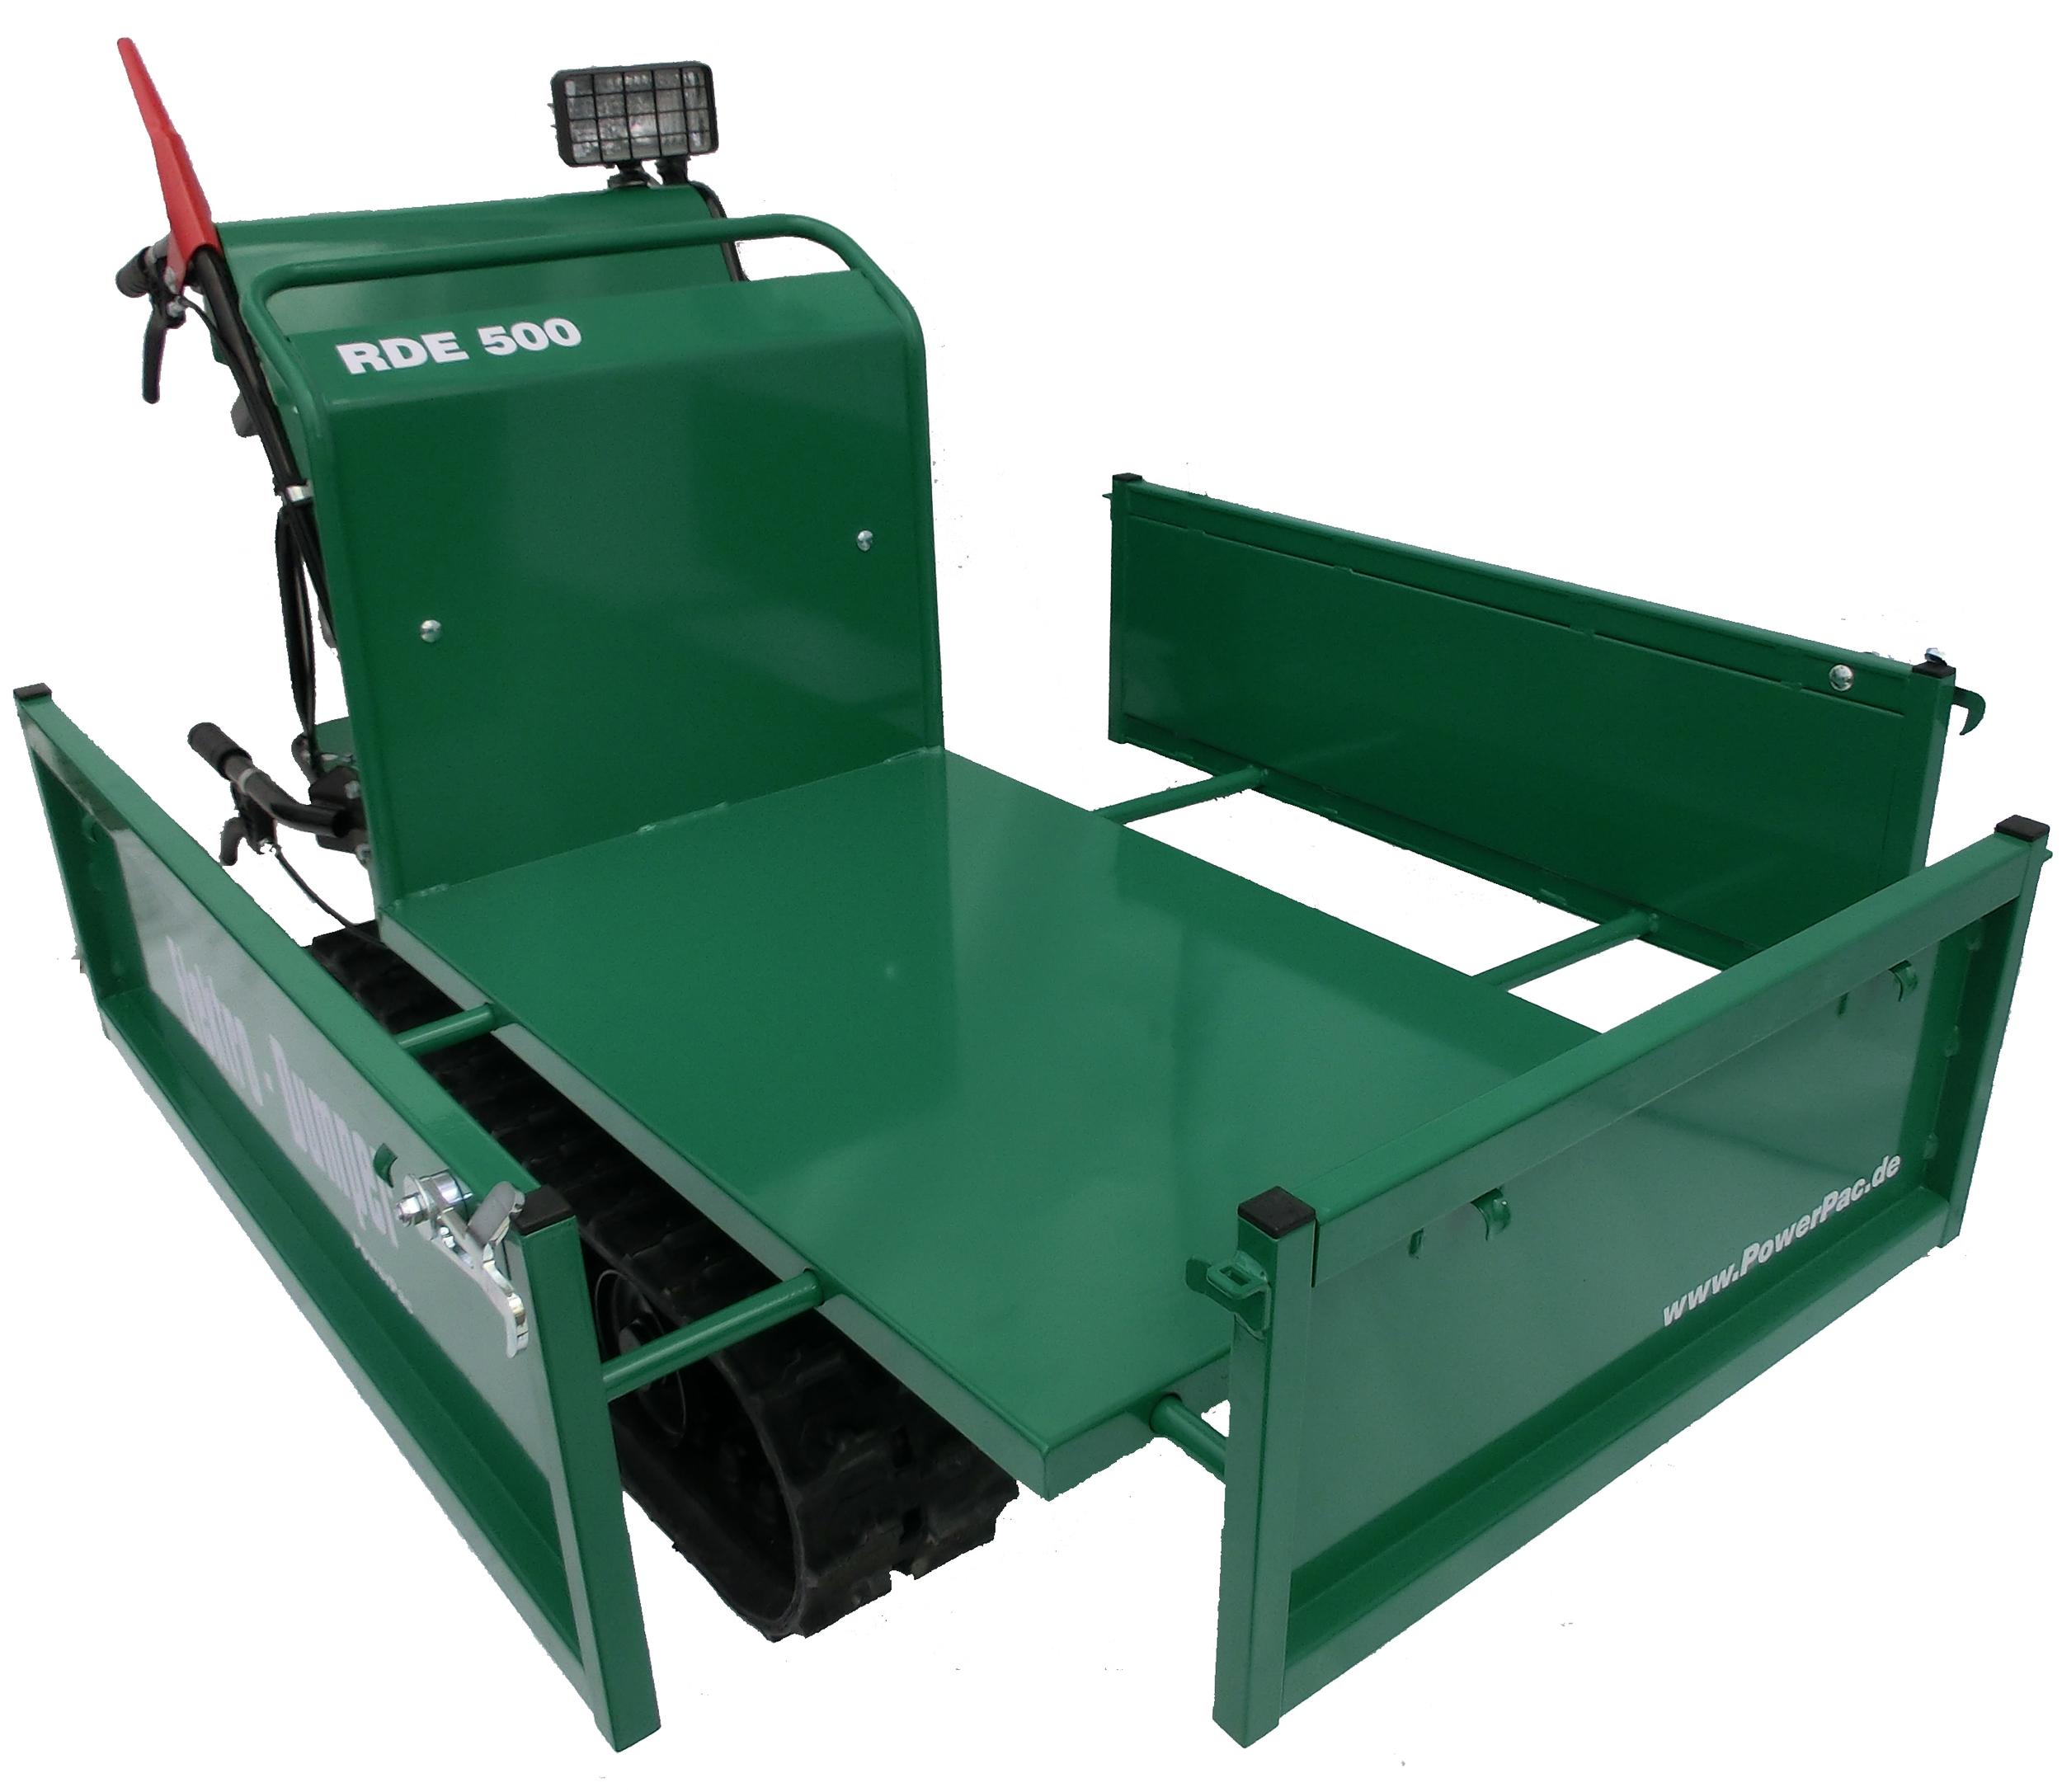 RDE500_Electric_Dumper_Tray_PMI_Equipment